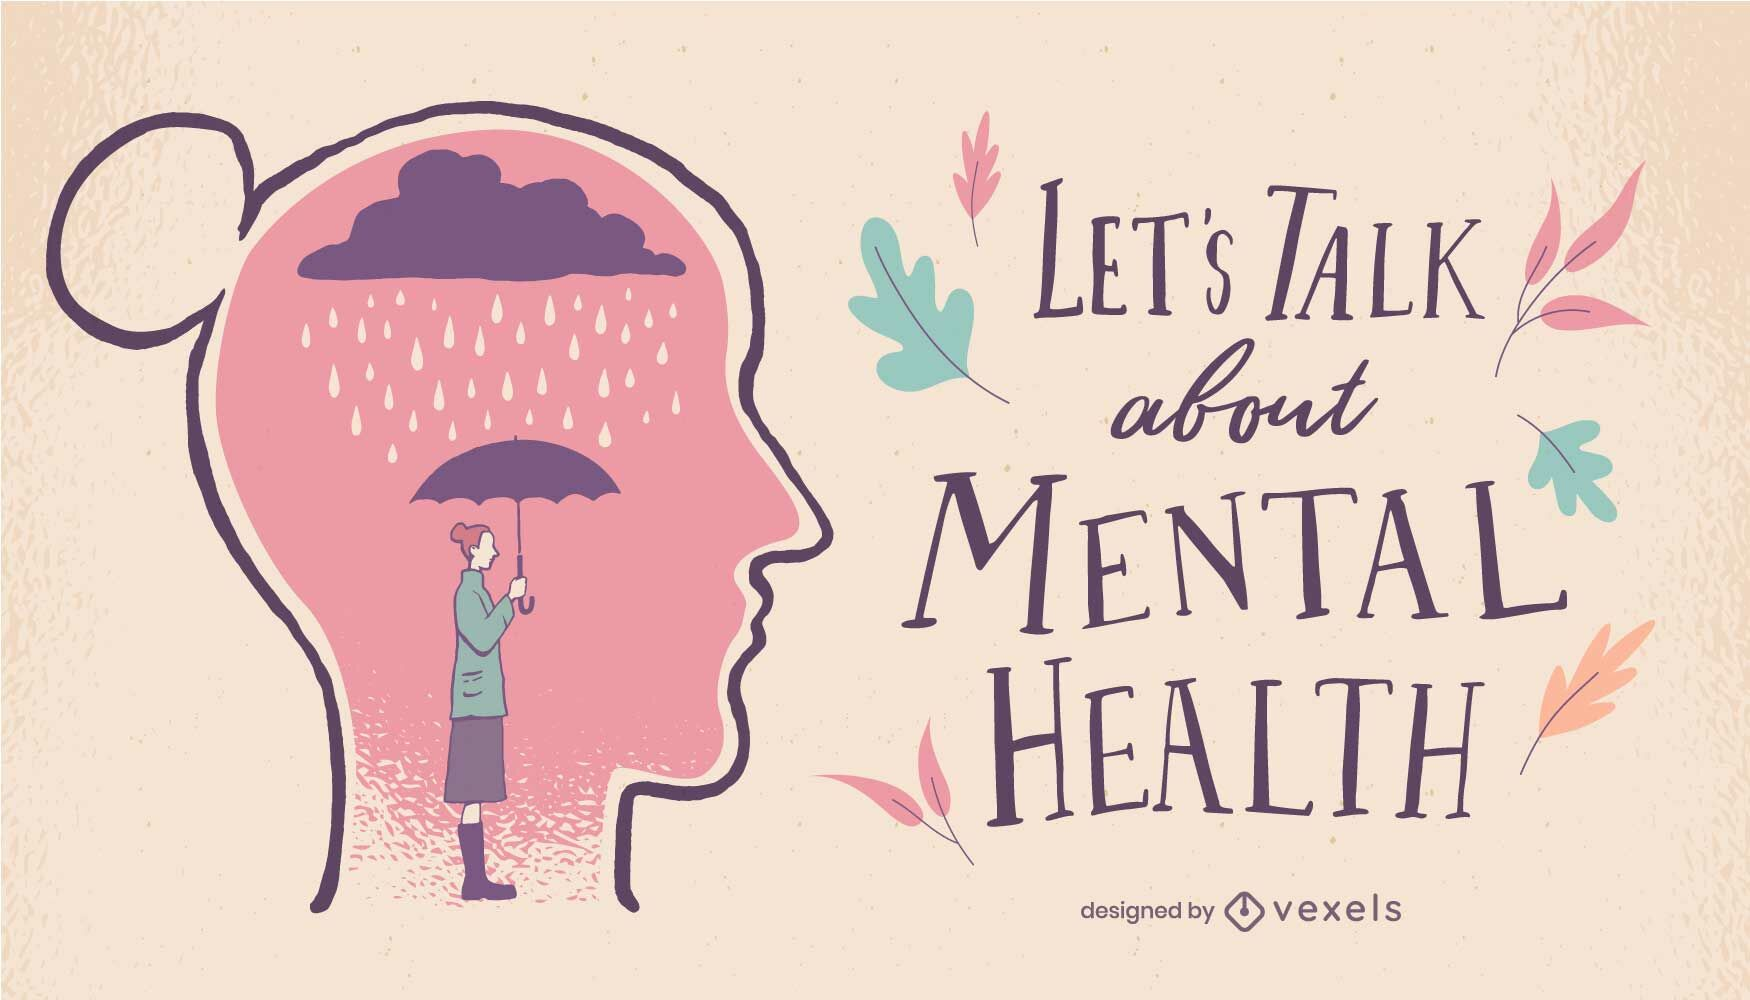 Beautiful mental health letterign design